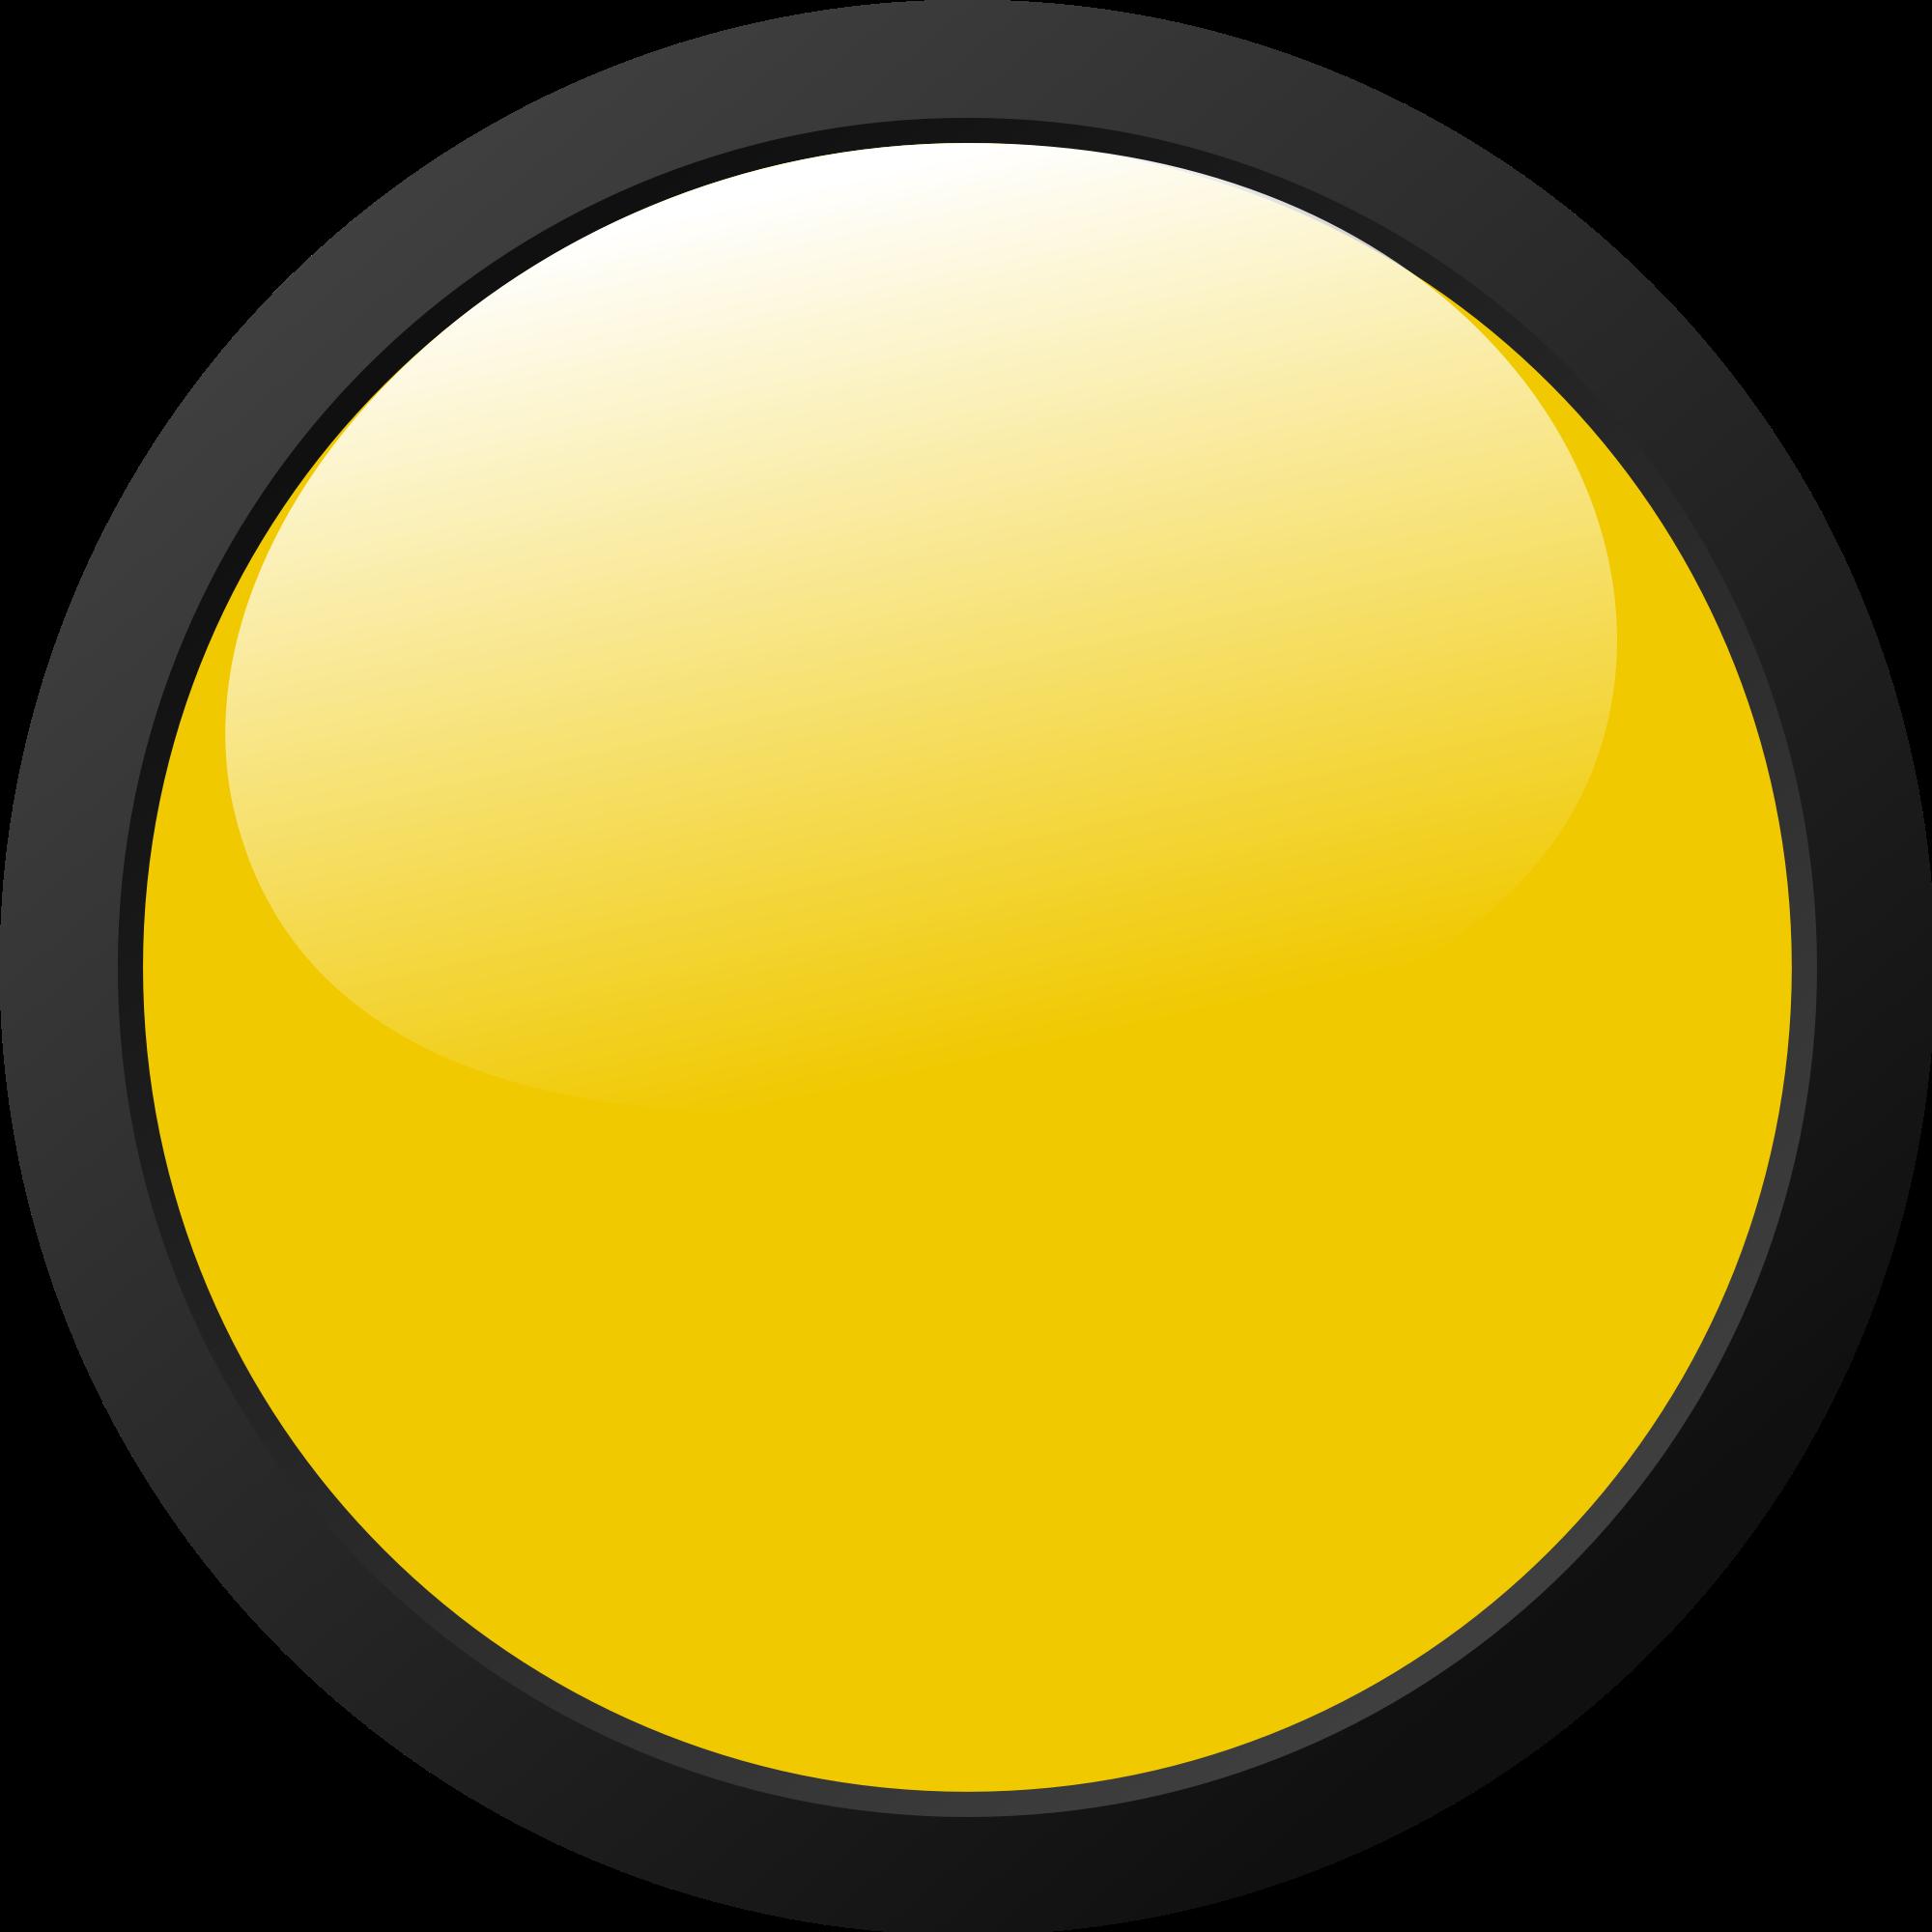 File:Yellow Light Icon.svg.